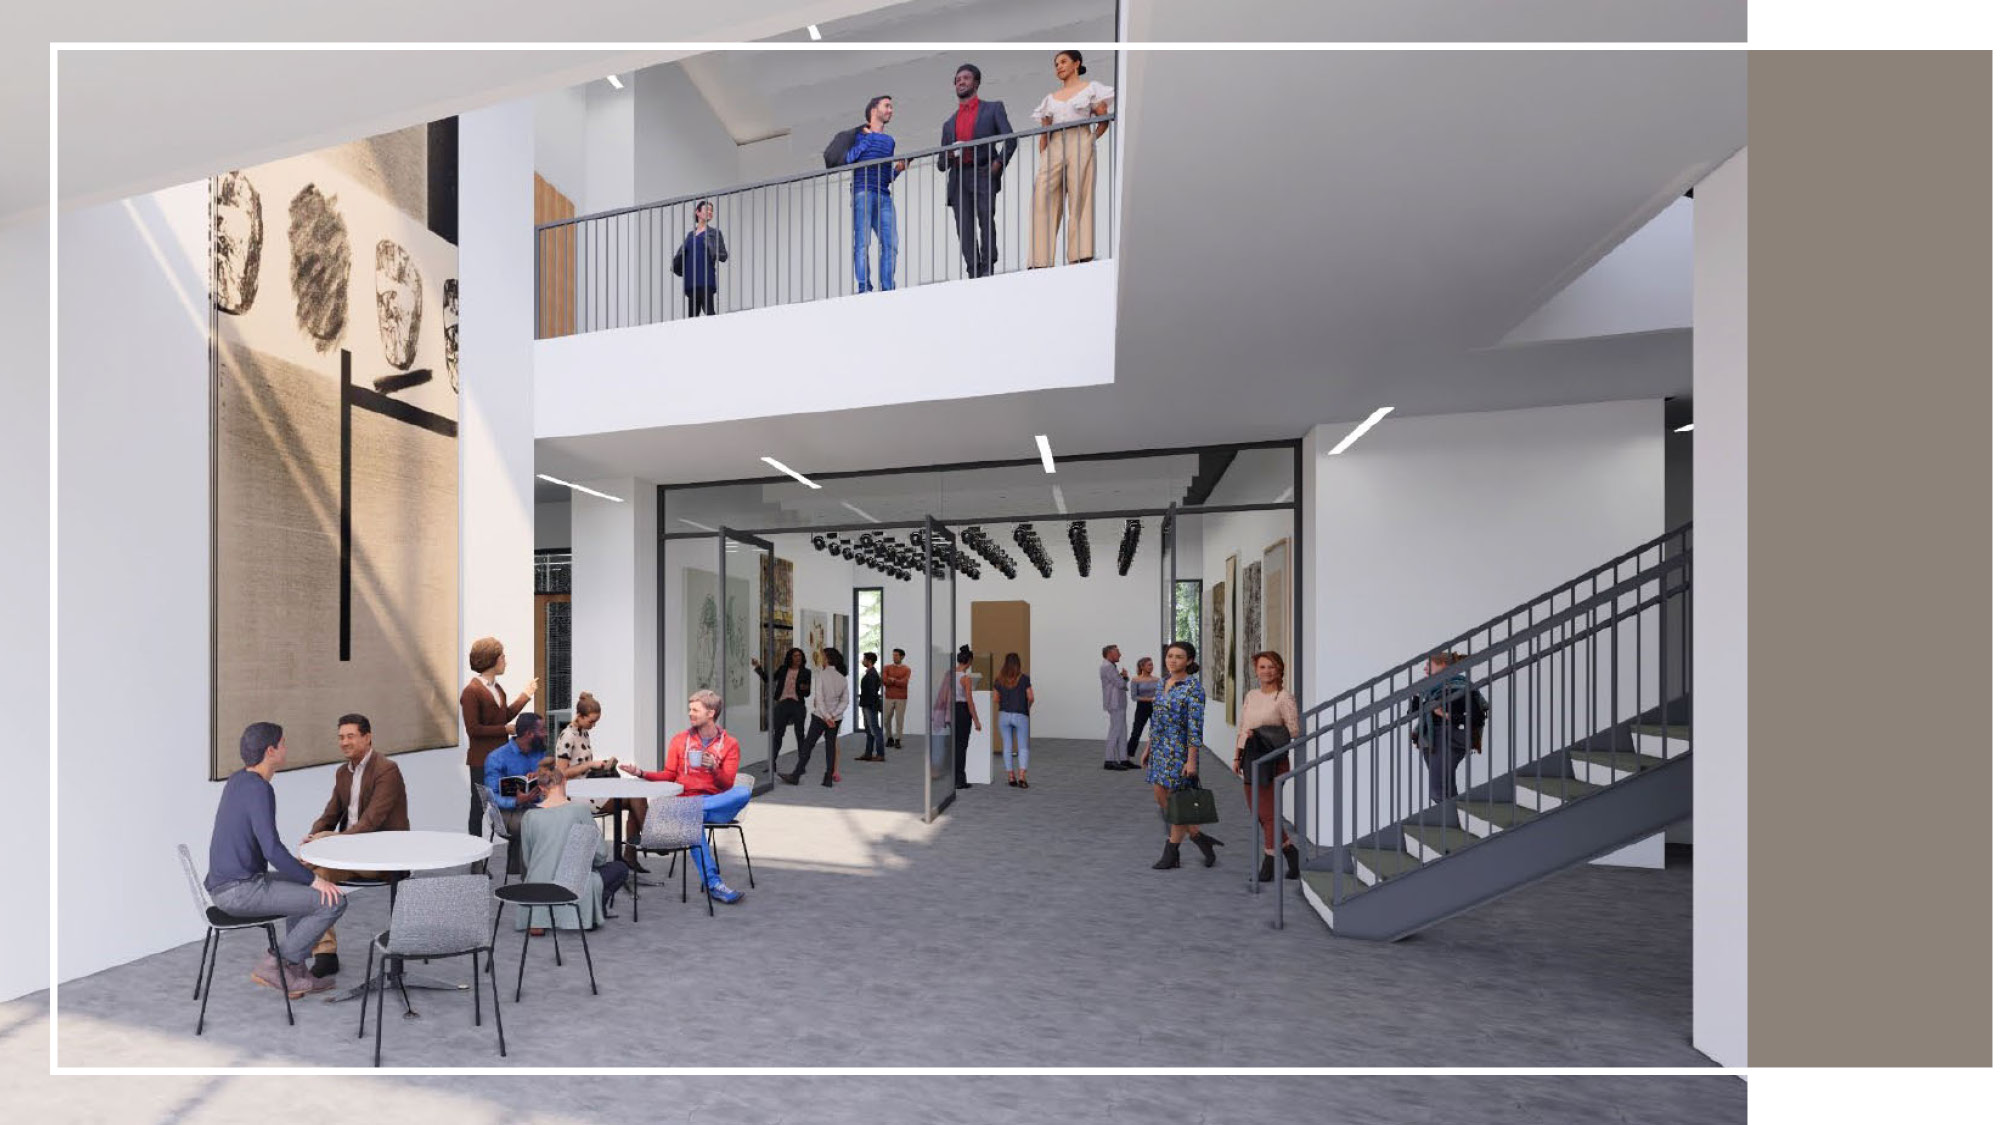 VA building Interior concept 4 photo